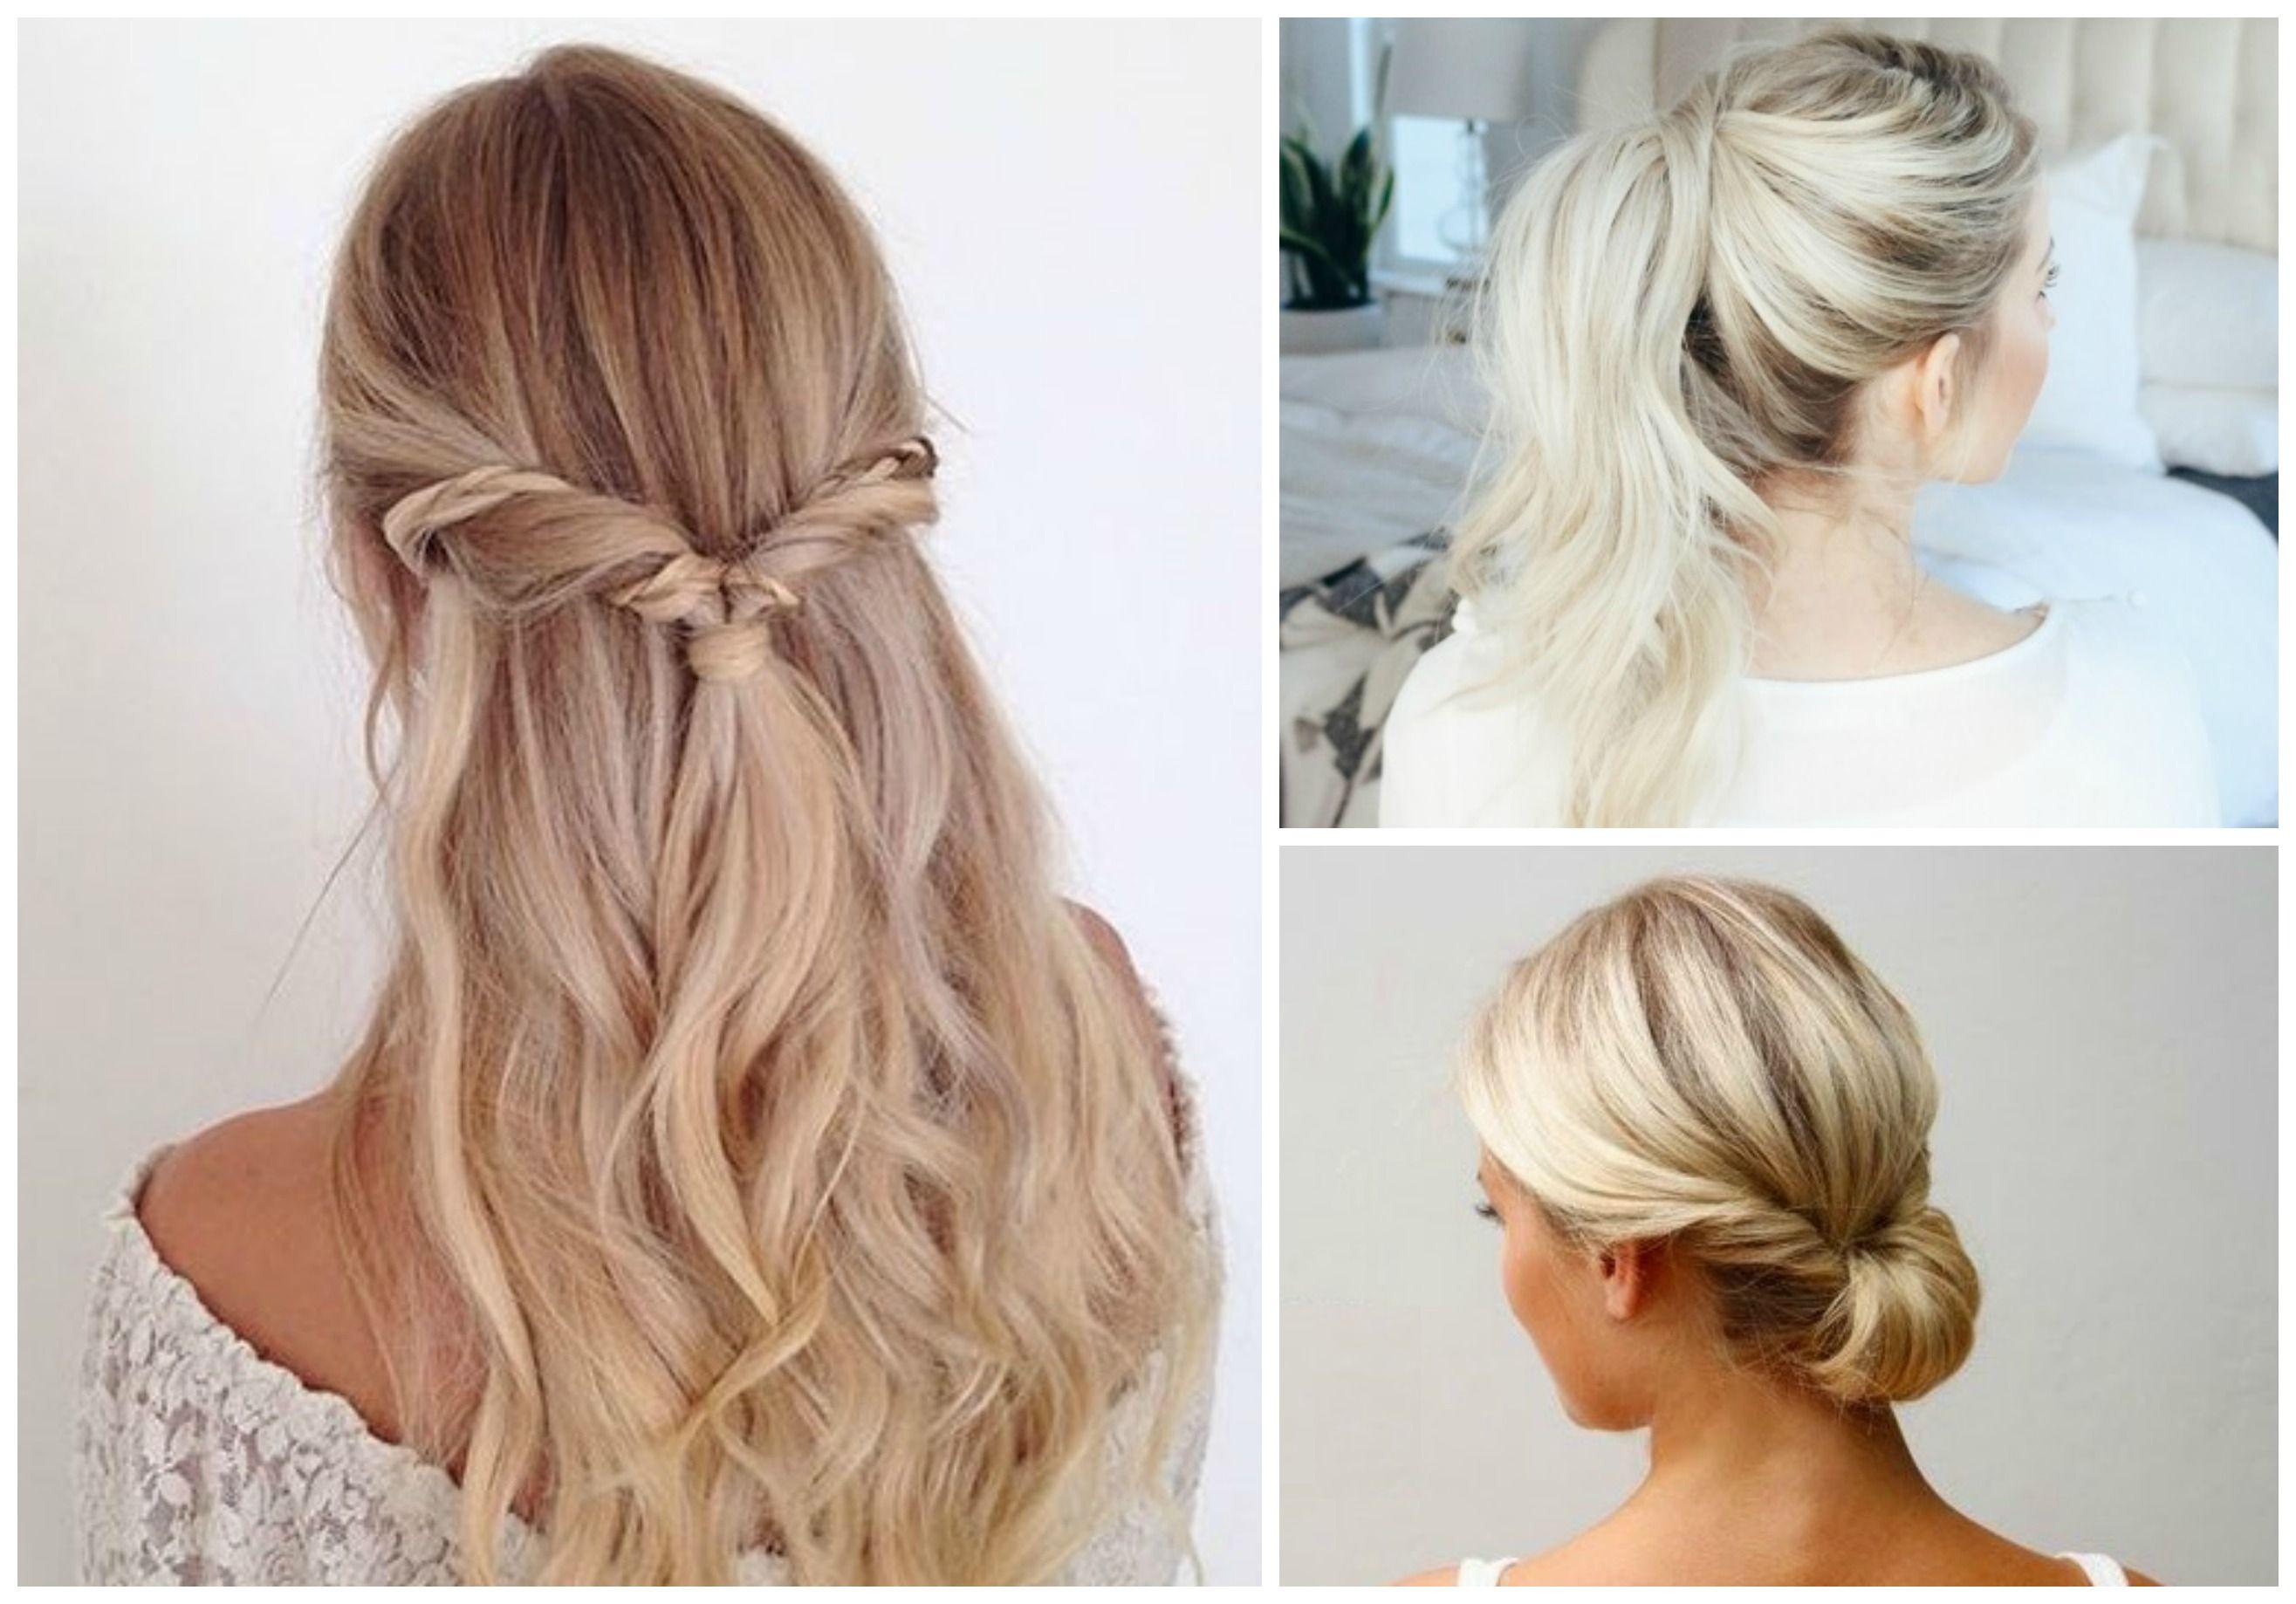 Pin By Tiffani Eilerman On Opalex Hair Easy Everyday Hairstyles Cute Simple Hairstyles Easy Hairstyles For Long Hair